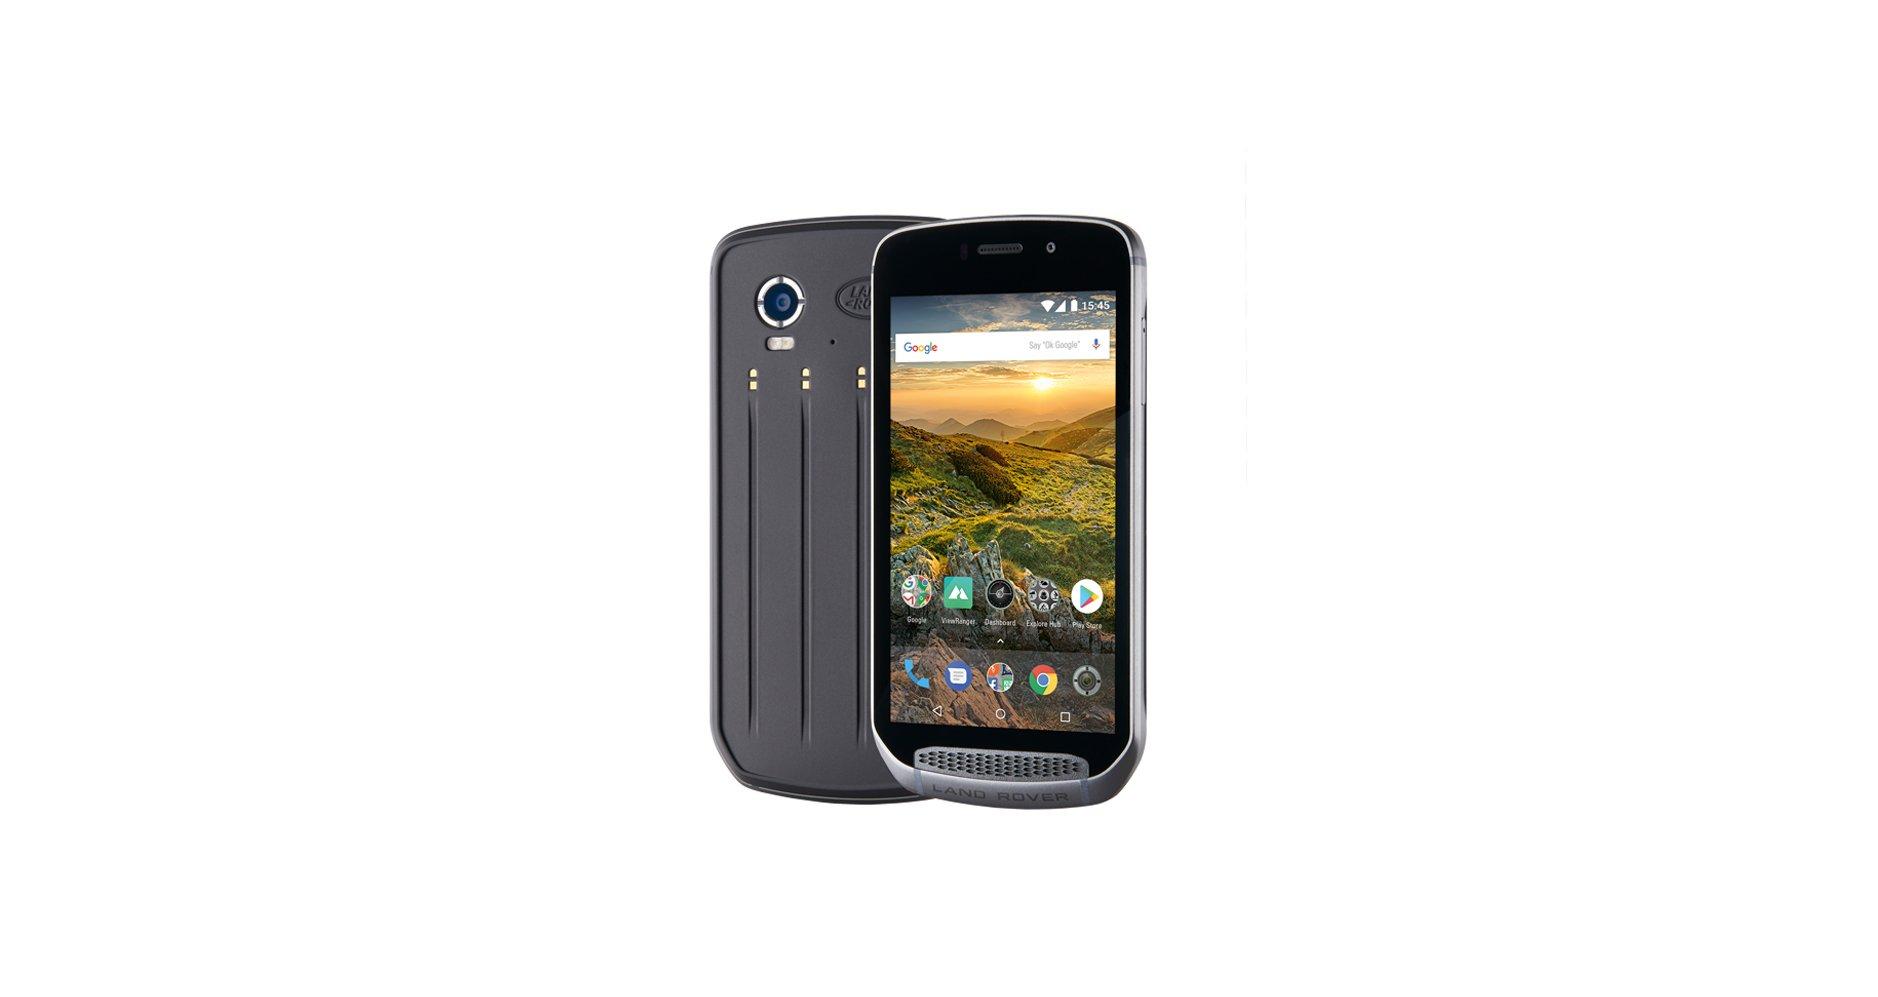 Landrover Explore Outdoor Phone Mobile